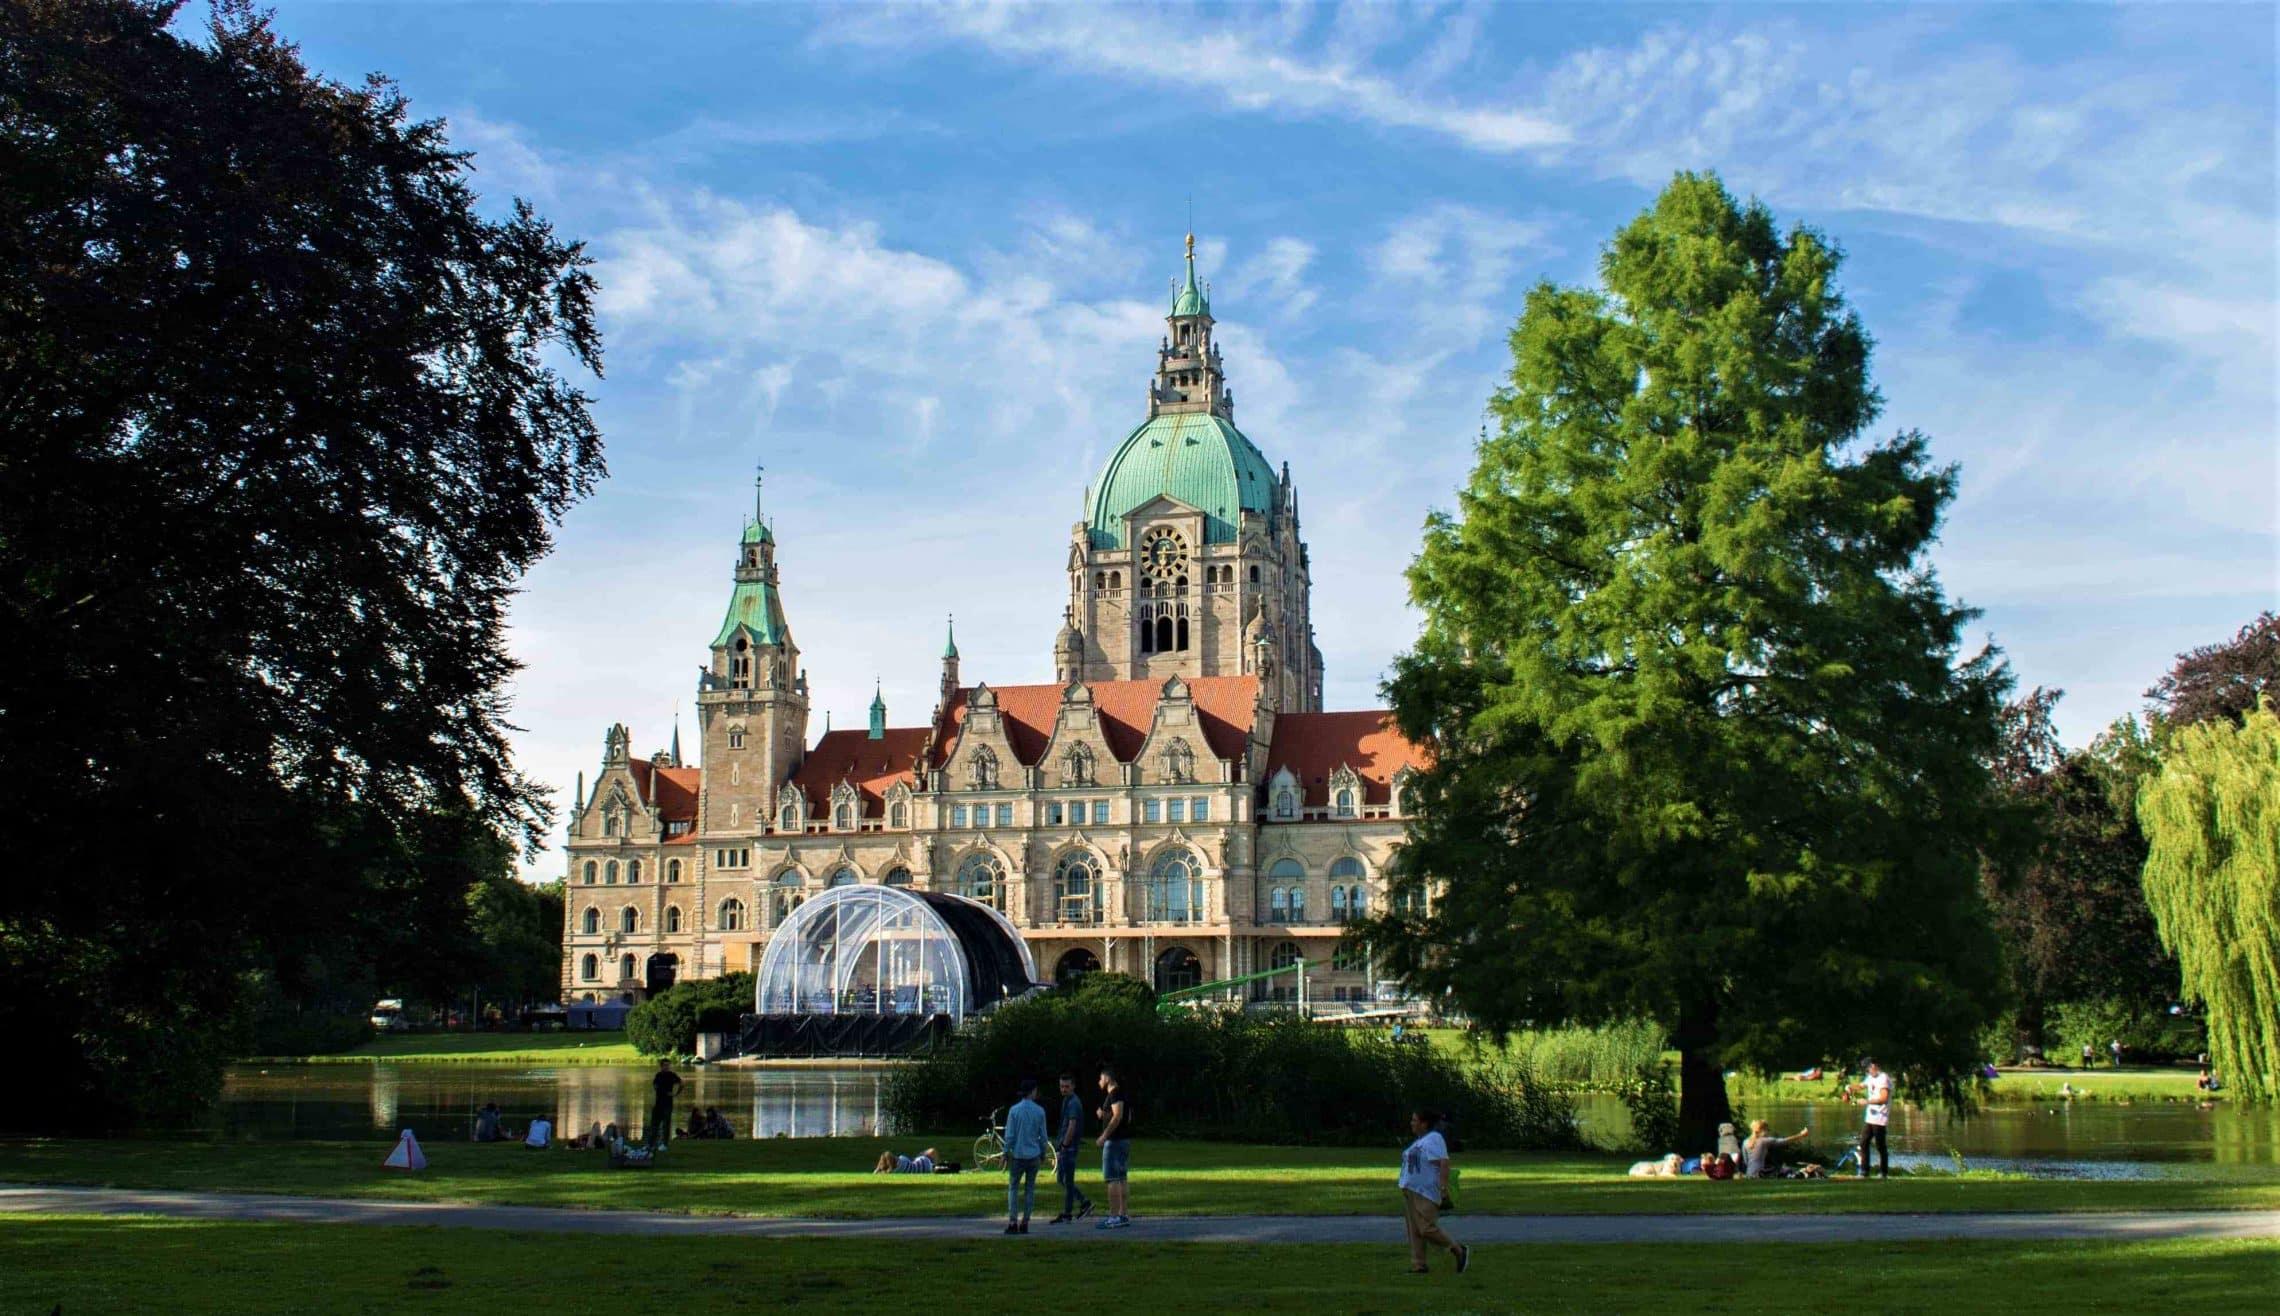 Style Hannover Bauwerke Rathaus 1 frenjaminbenklin - Nicht verpassen: Hannovers Palast